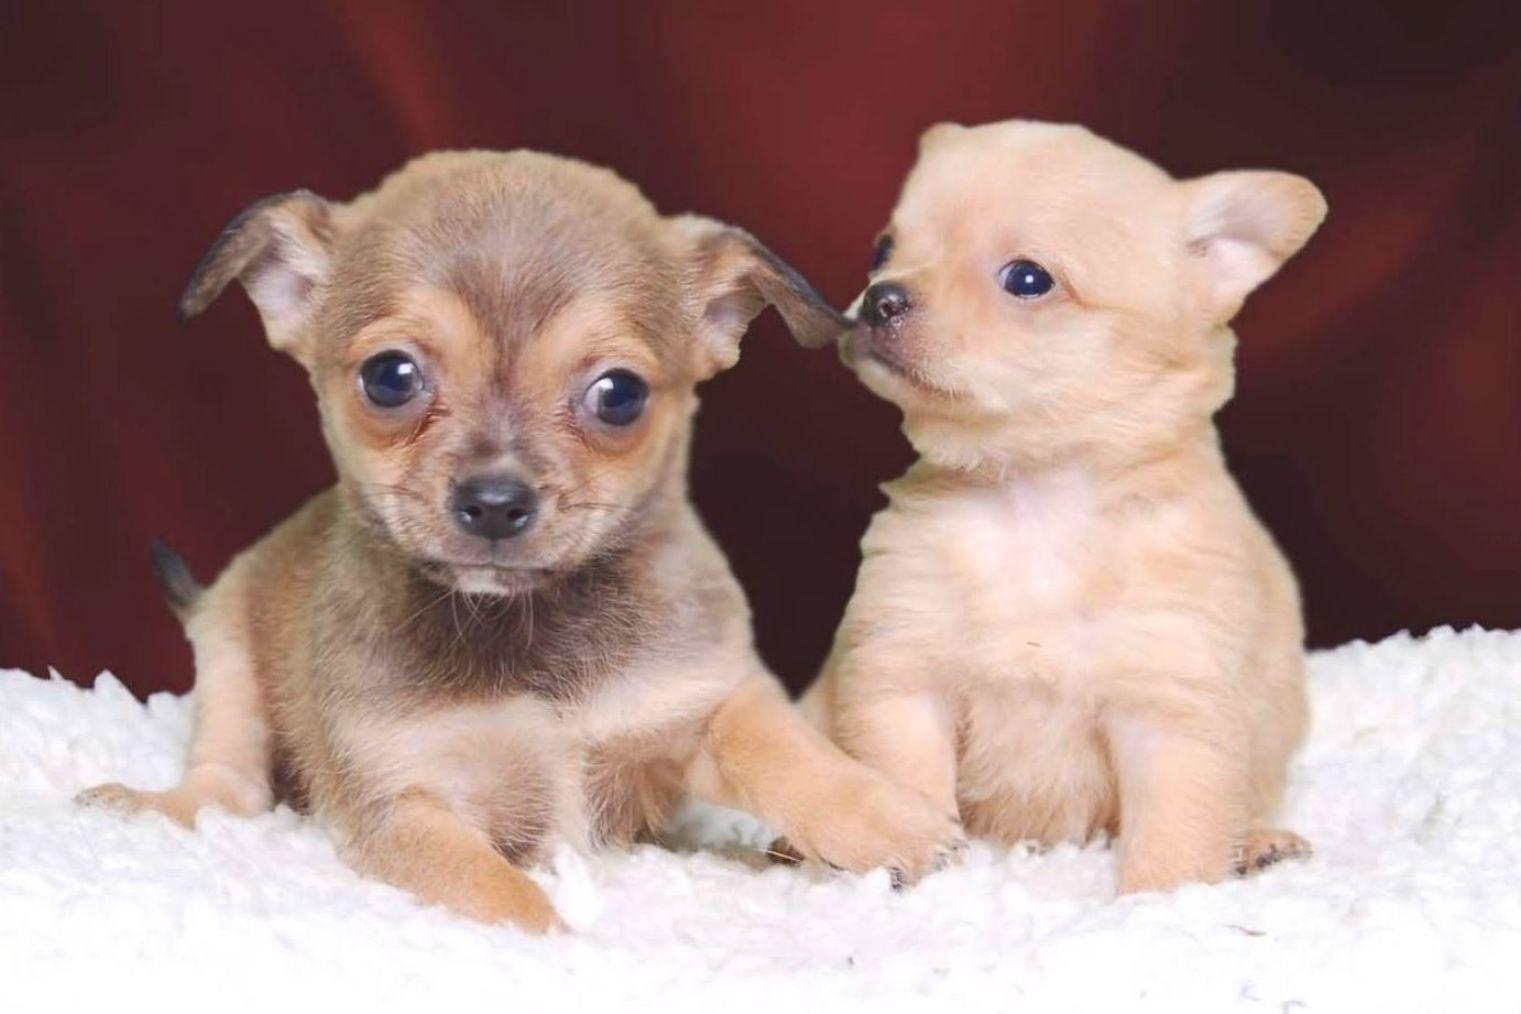 Chihuahuas Wallpaper Beautiful Big Brown Eyes Chihuahua Puppies Cute Chihuahua Chihuahua